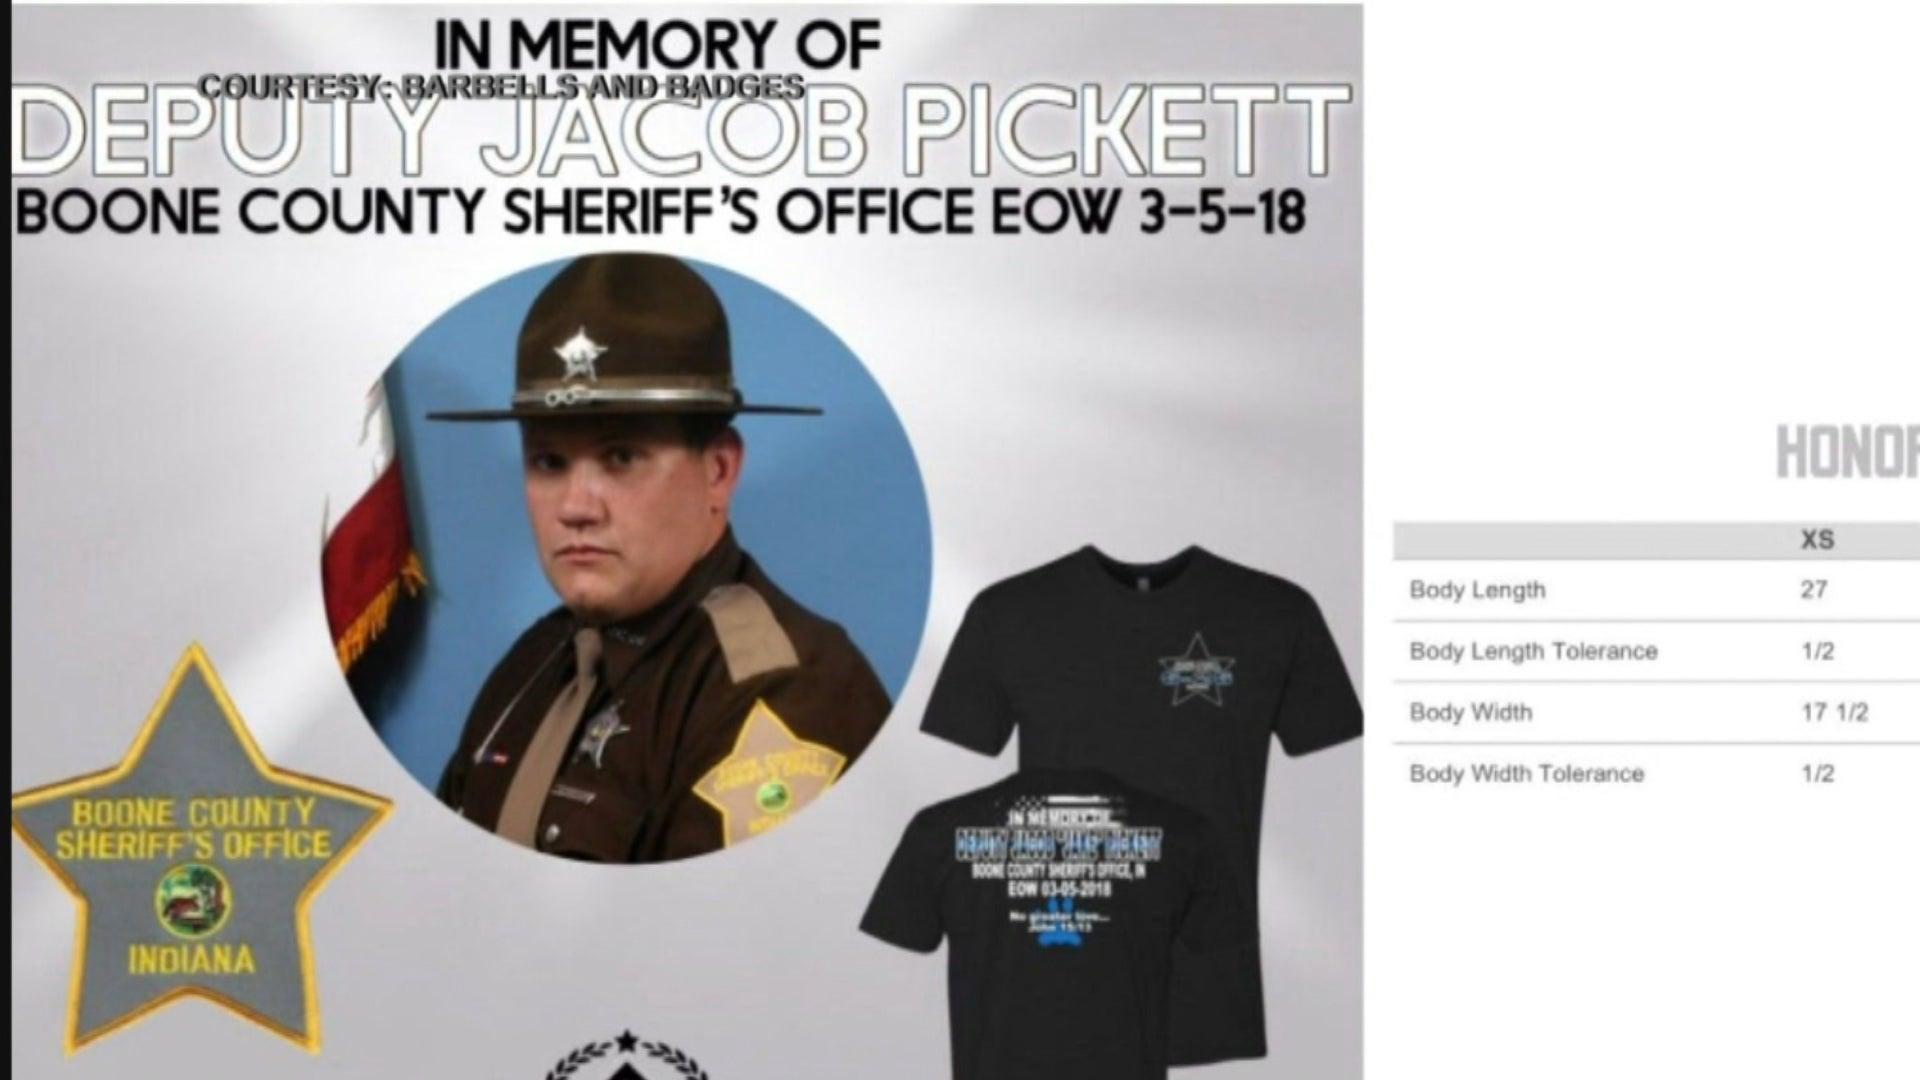 T-shirts to honor Deputy Pickett, help fund Washington trip